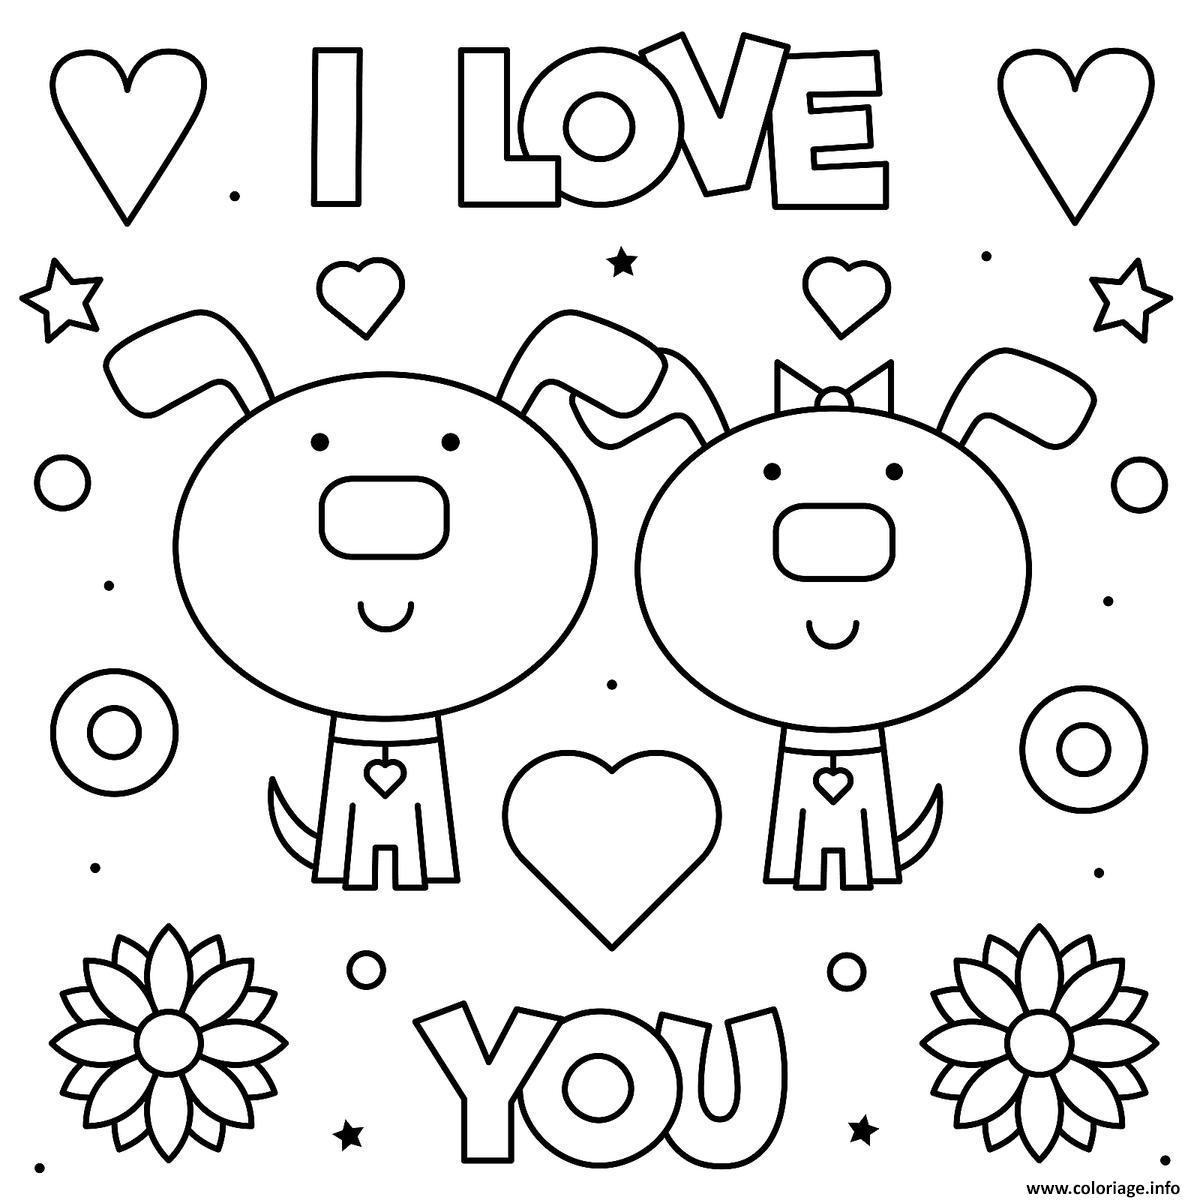 Coloriage I Love You Je Taime Deux Chiens Adorable Dessin